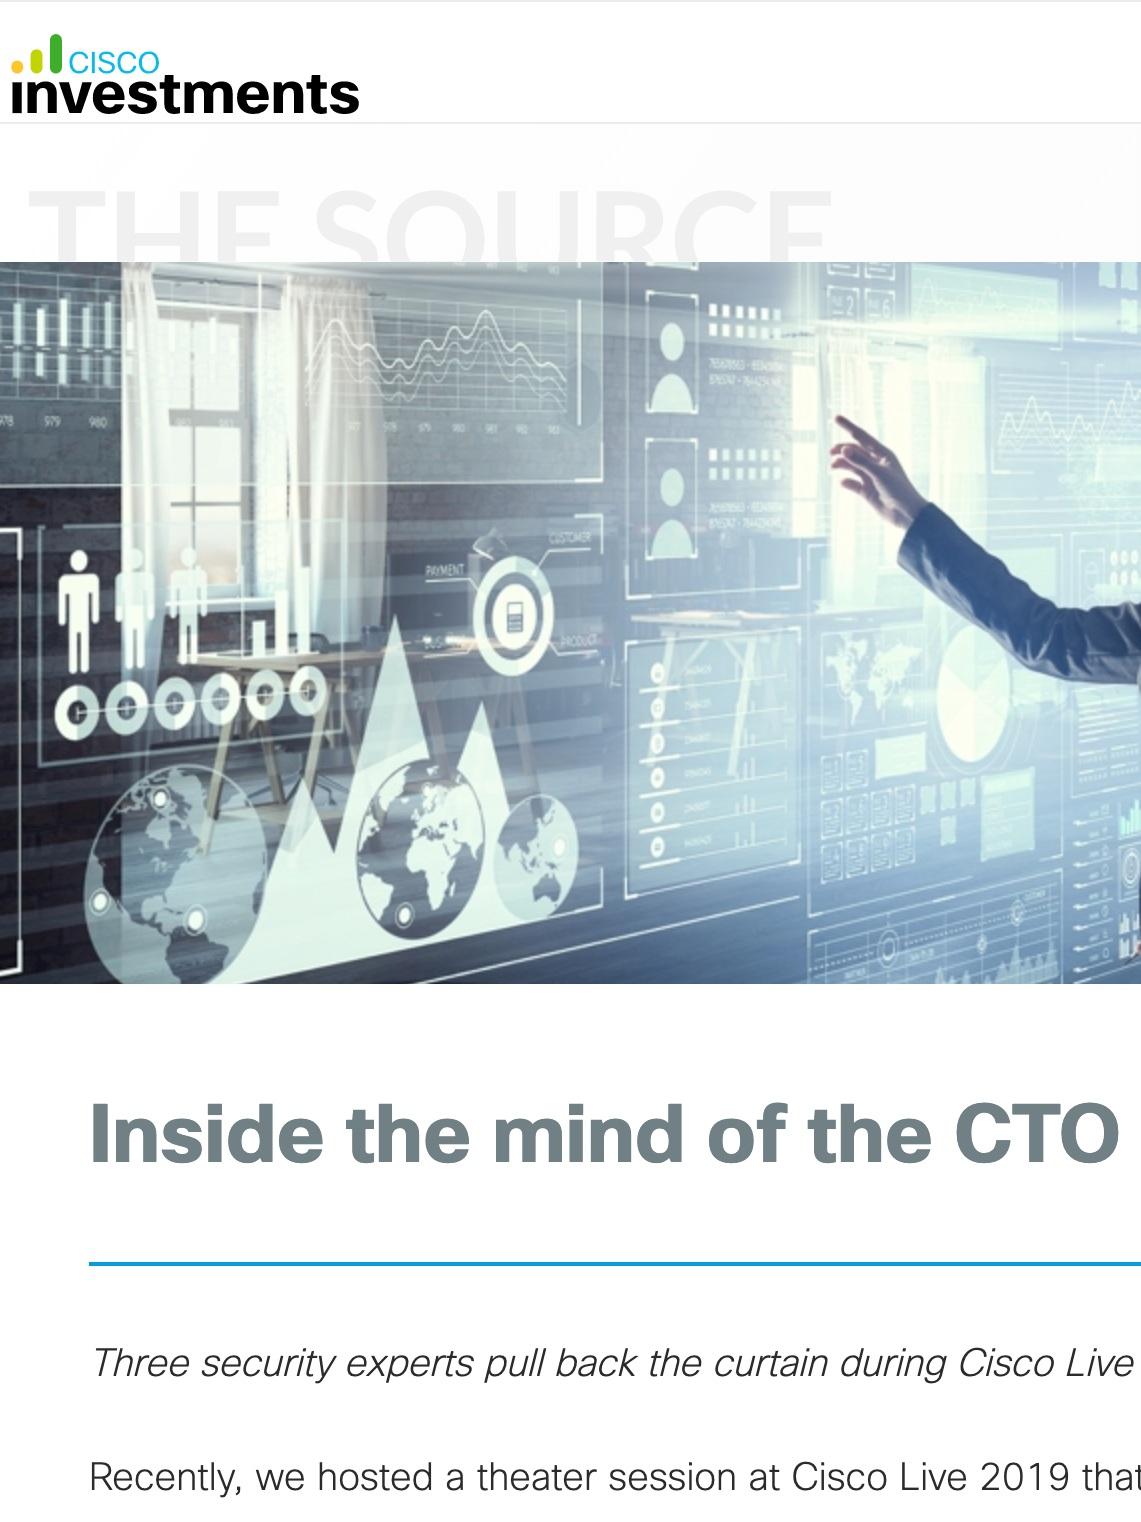 Cisco Investments, 2019. Blog.